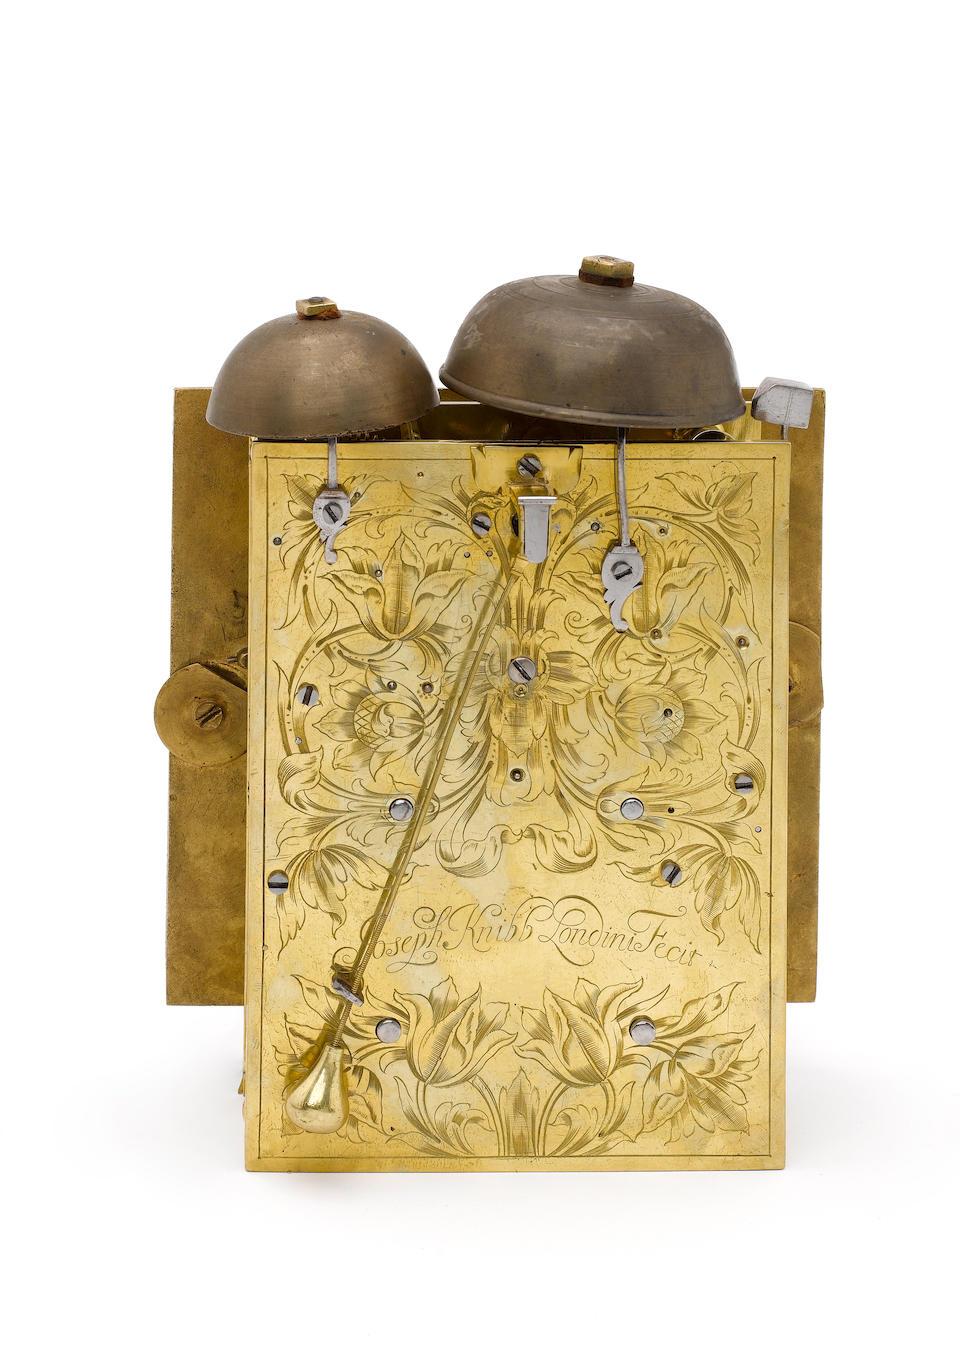 A fine late 17th century gilt metal mounted ebony veneered quarter repeating bracket clock Joseph Knibb, London